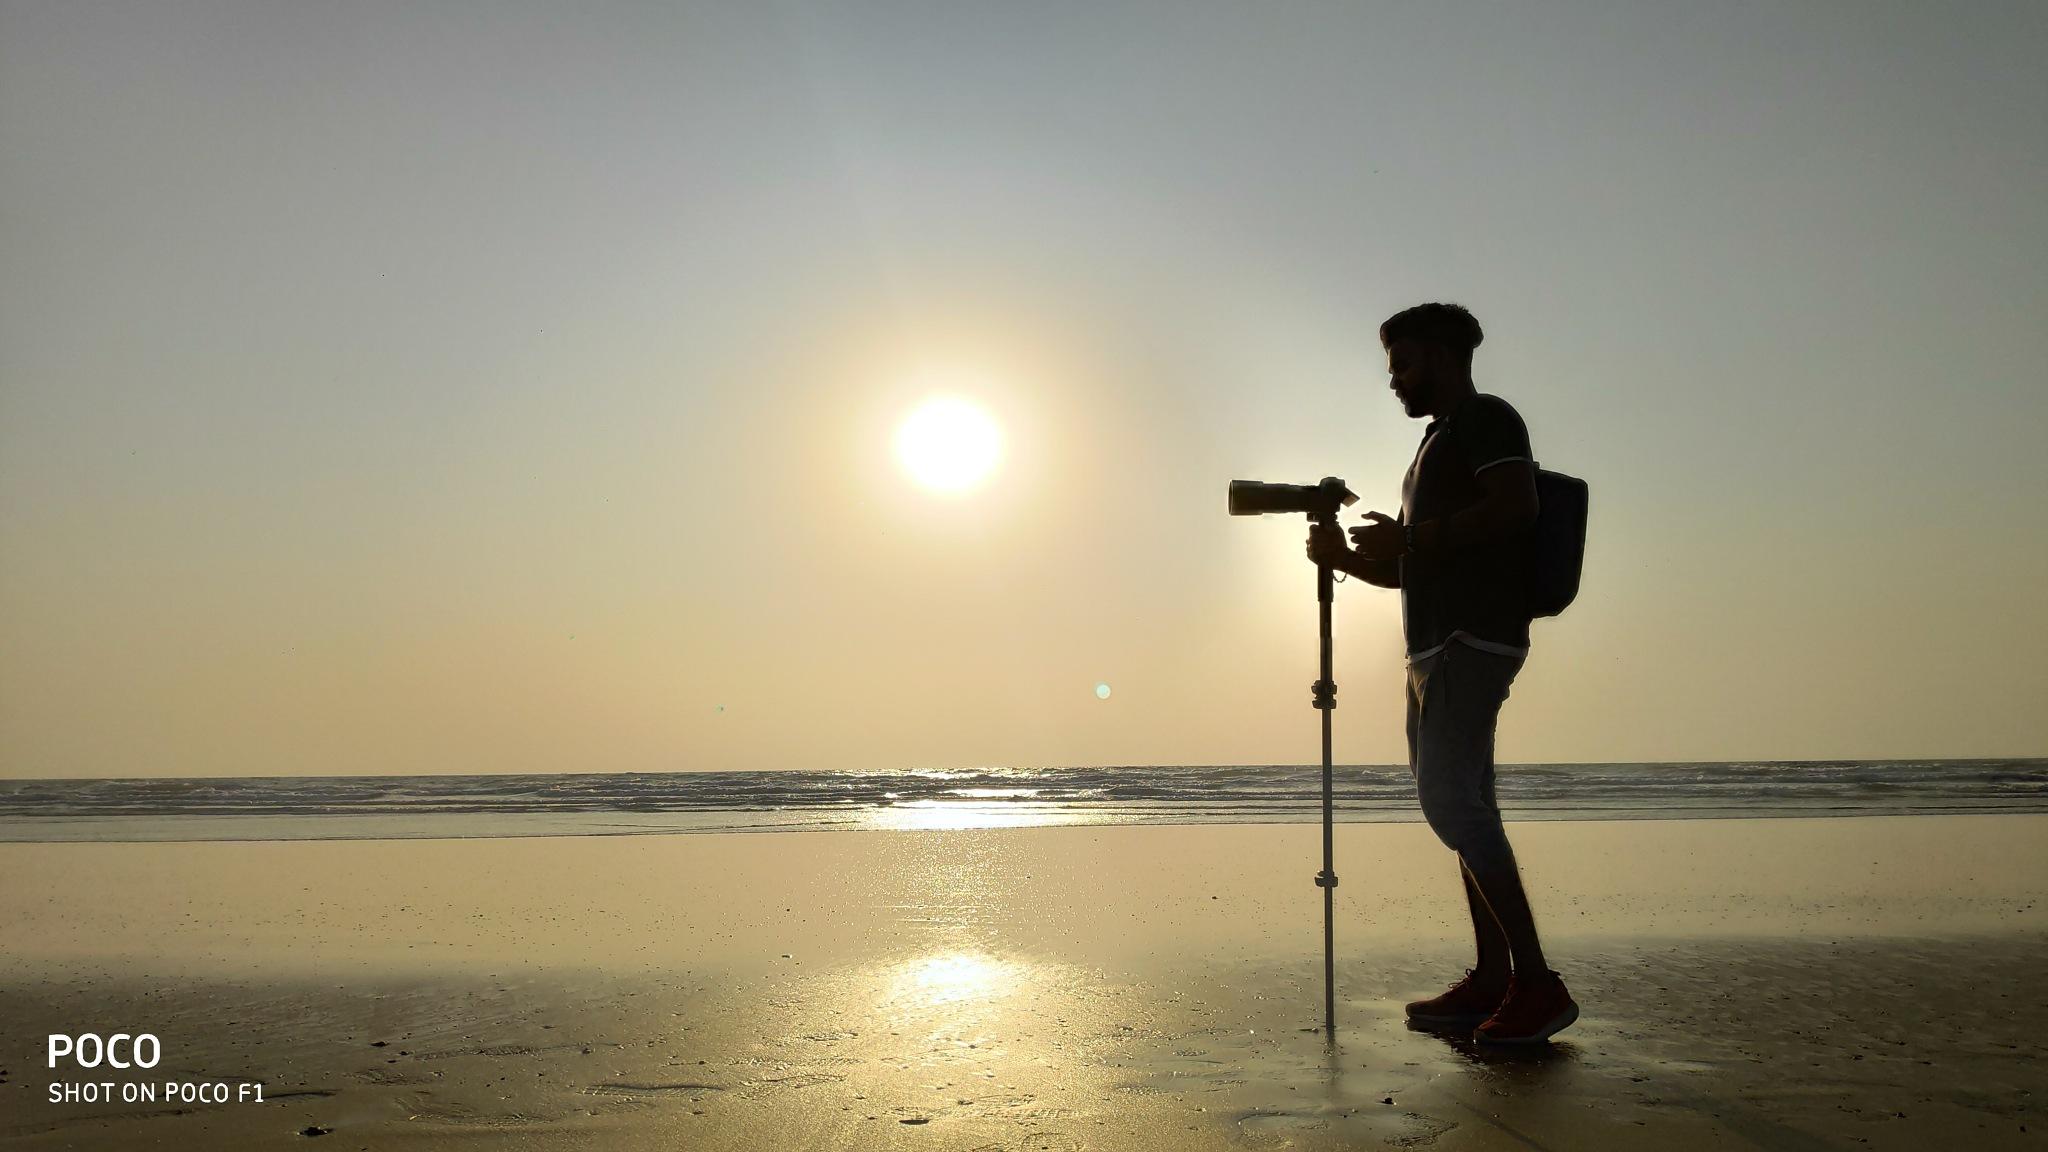 Sony Alpha user by Shubham patil